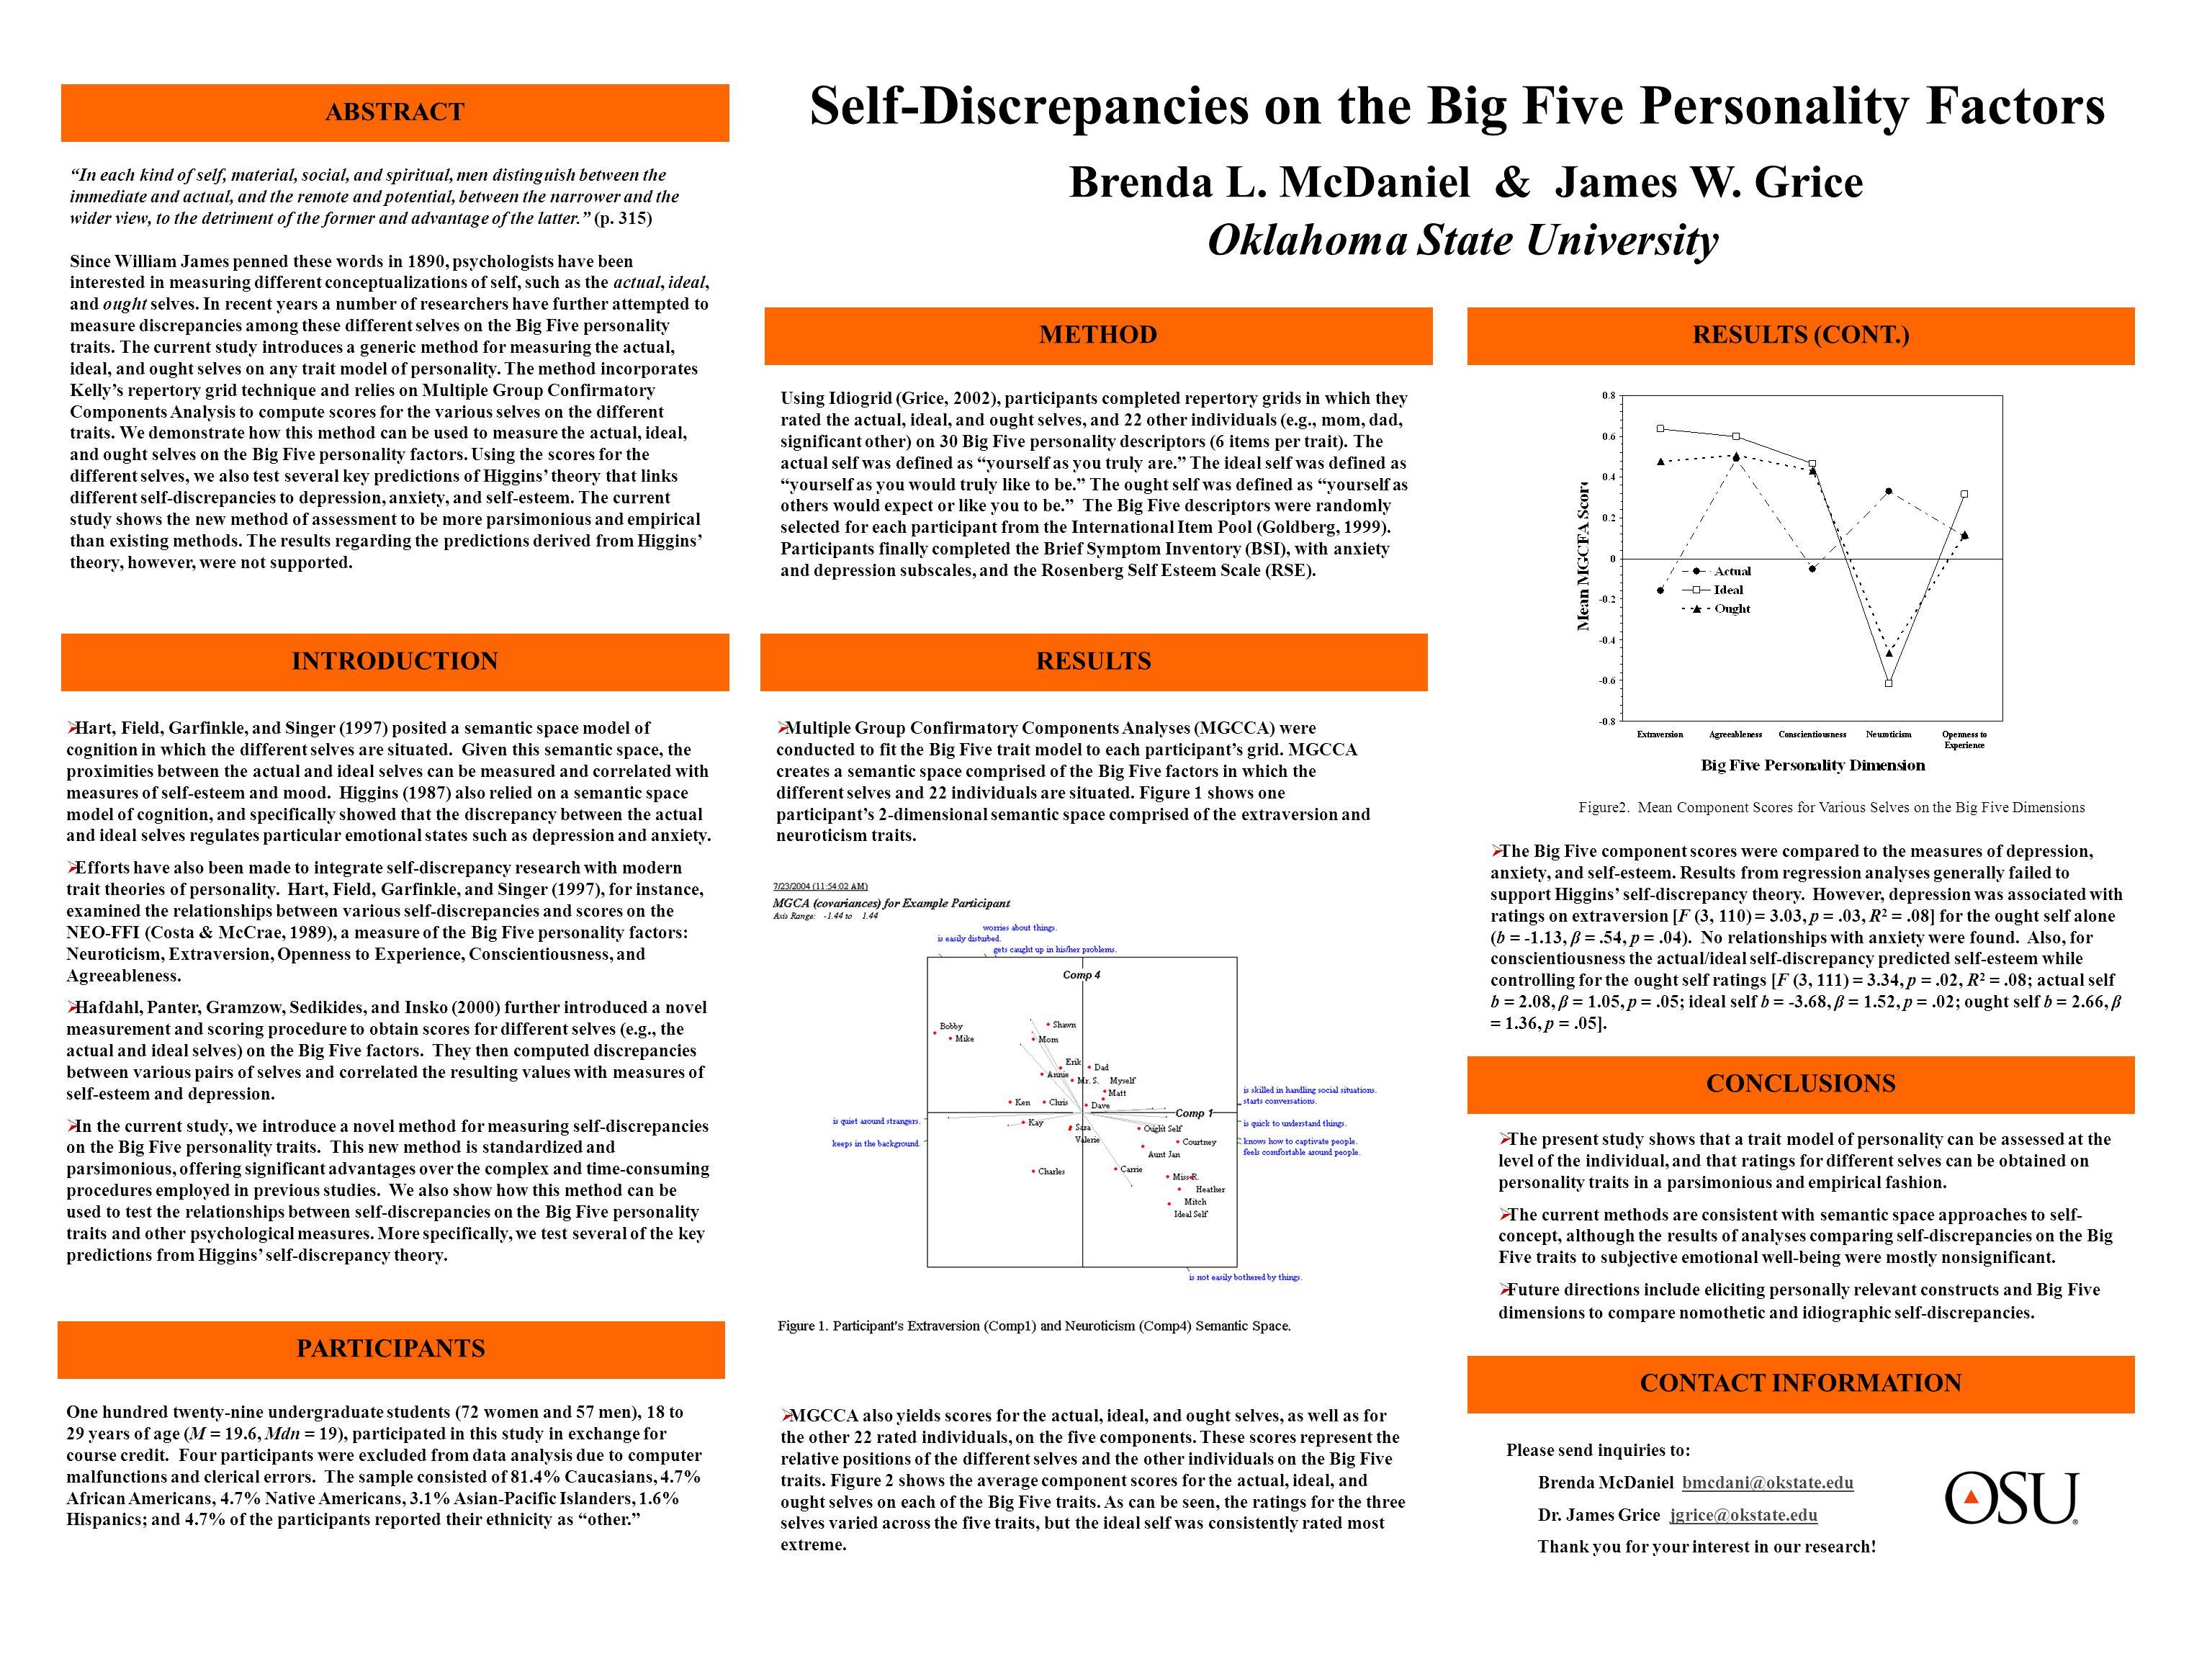 "Self-Discrepancies on the Big Five Personality Factors METHOD ""In each kind of self, material, social, and spiritual, men distinguish between the imme"